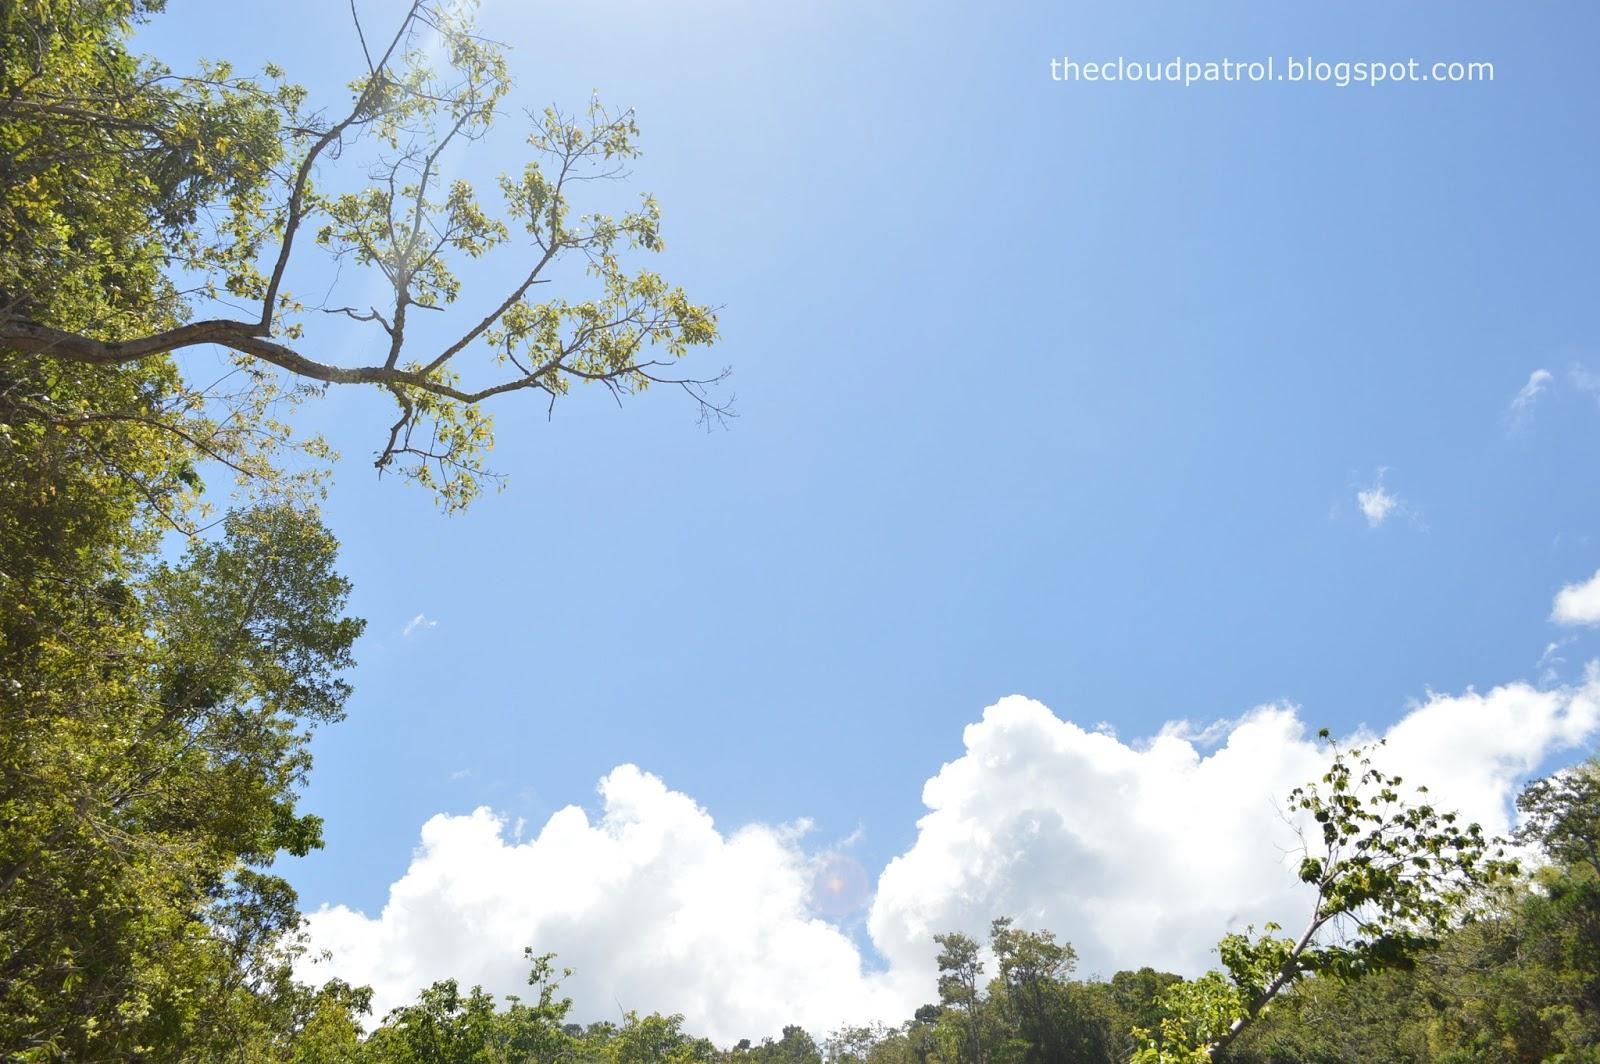 Butanding, whale shark, cebu, oslob, philippines, Tumalog, Waterfalls, mountain, hiking, hike, treking, trek, nature, clouds, blue sky, sky